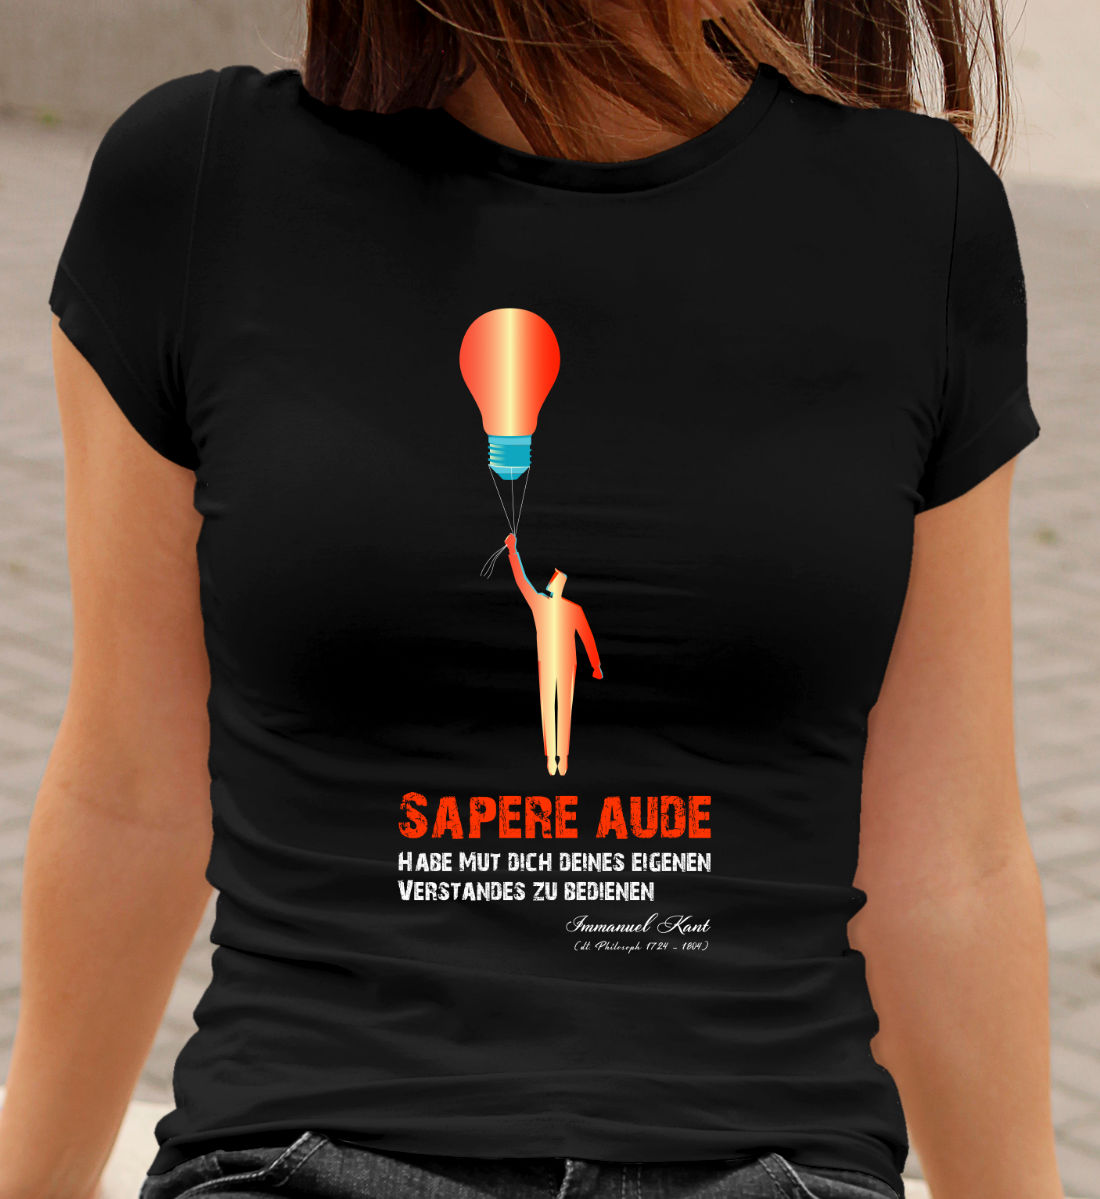 eace-shirts für Frieden - Sapere Aude